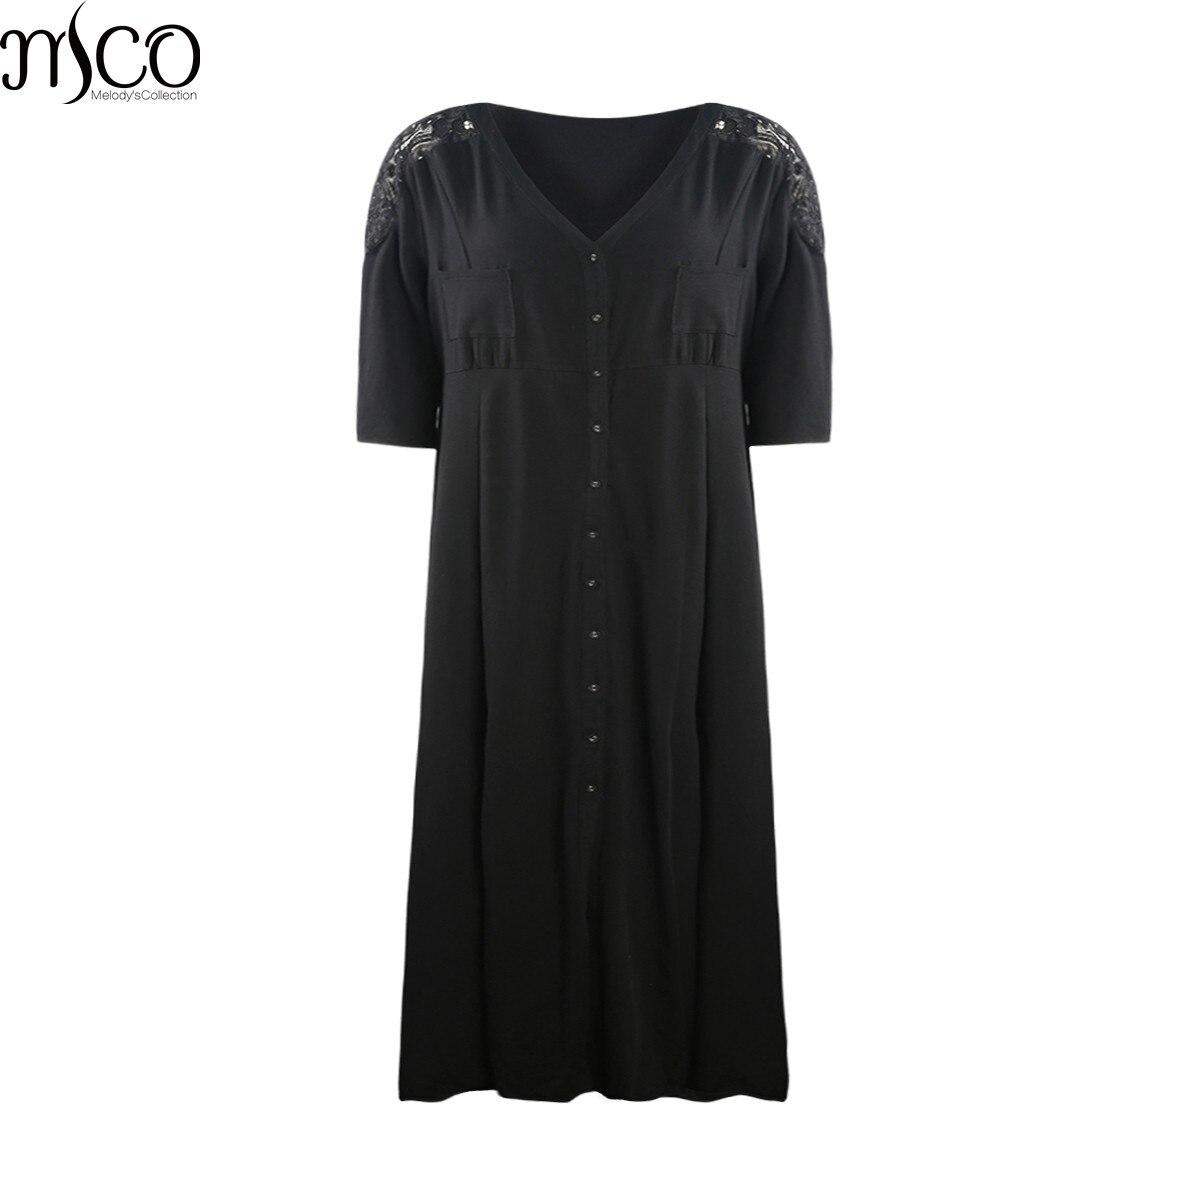 MCO 2018 Autumn Sexy High Split Plus Size Maxi Dress Floral Lace Insert  Long Dresses Basic efda9f000049